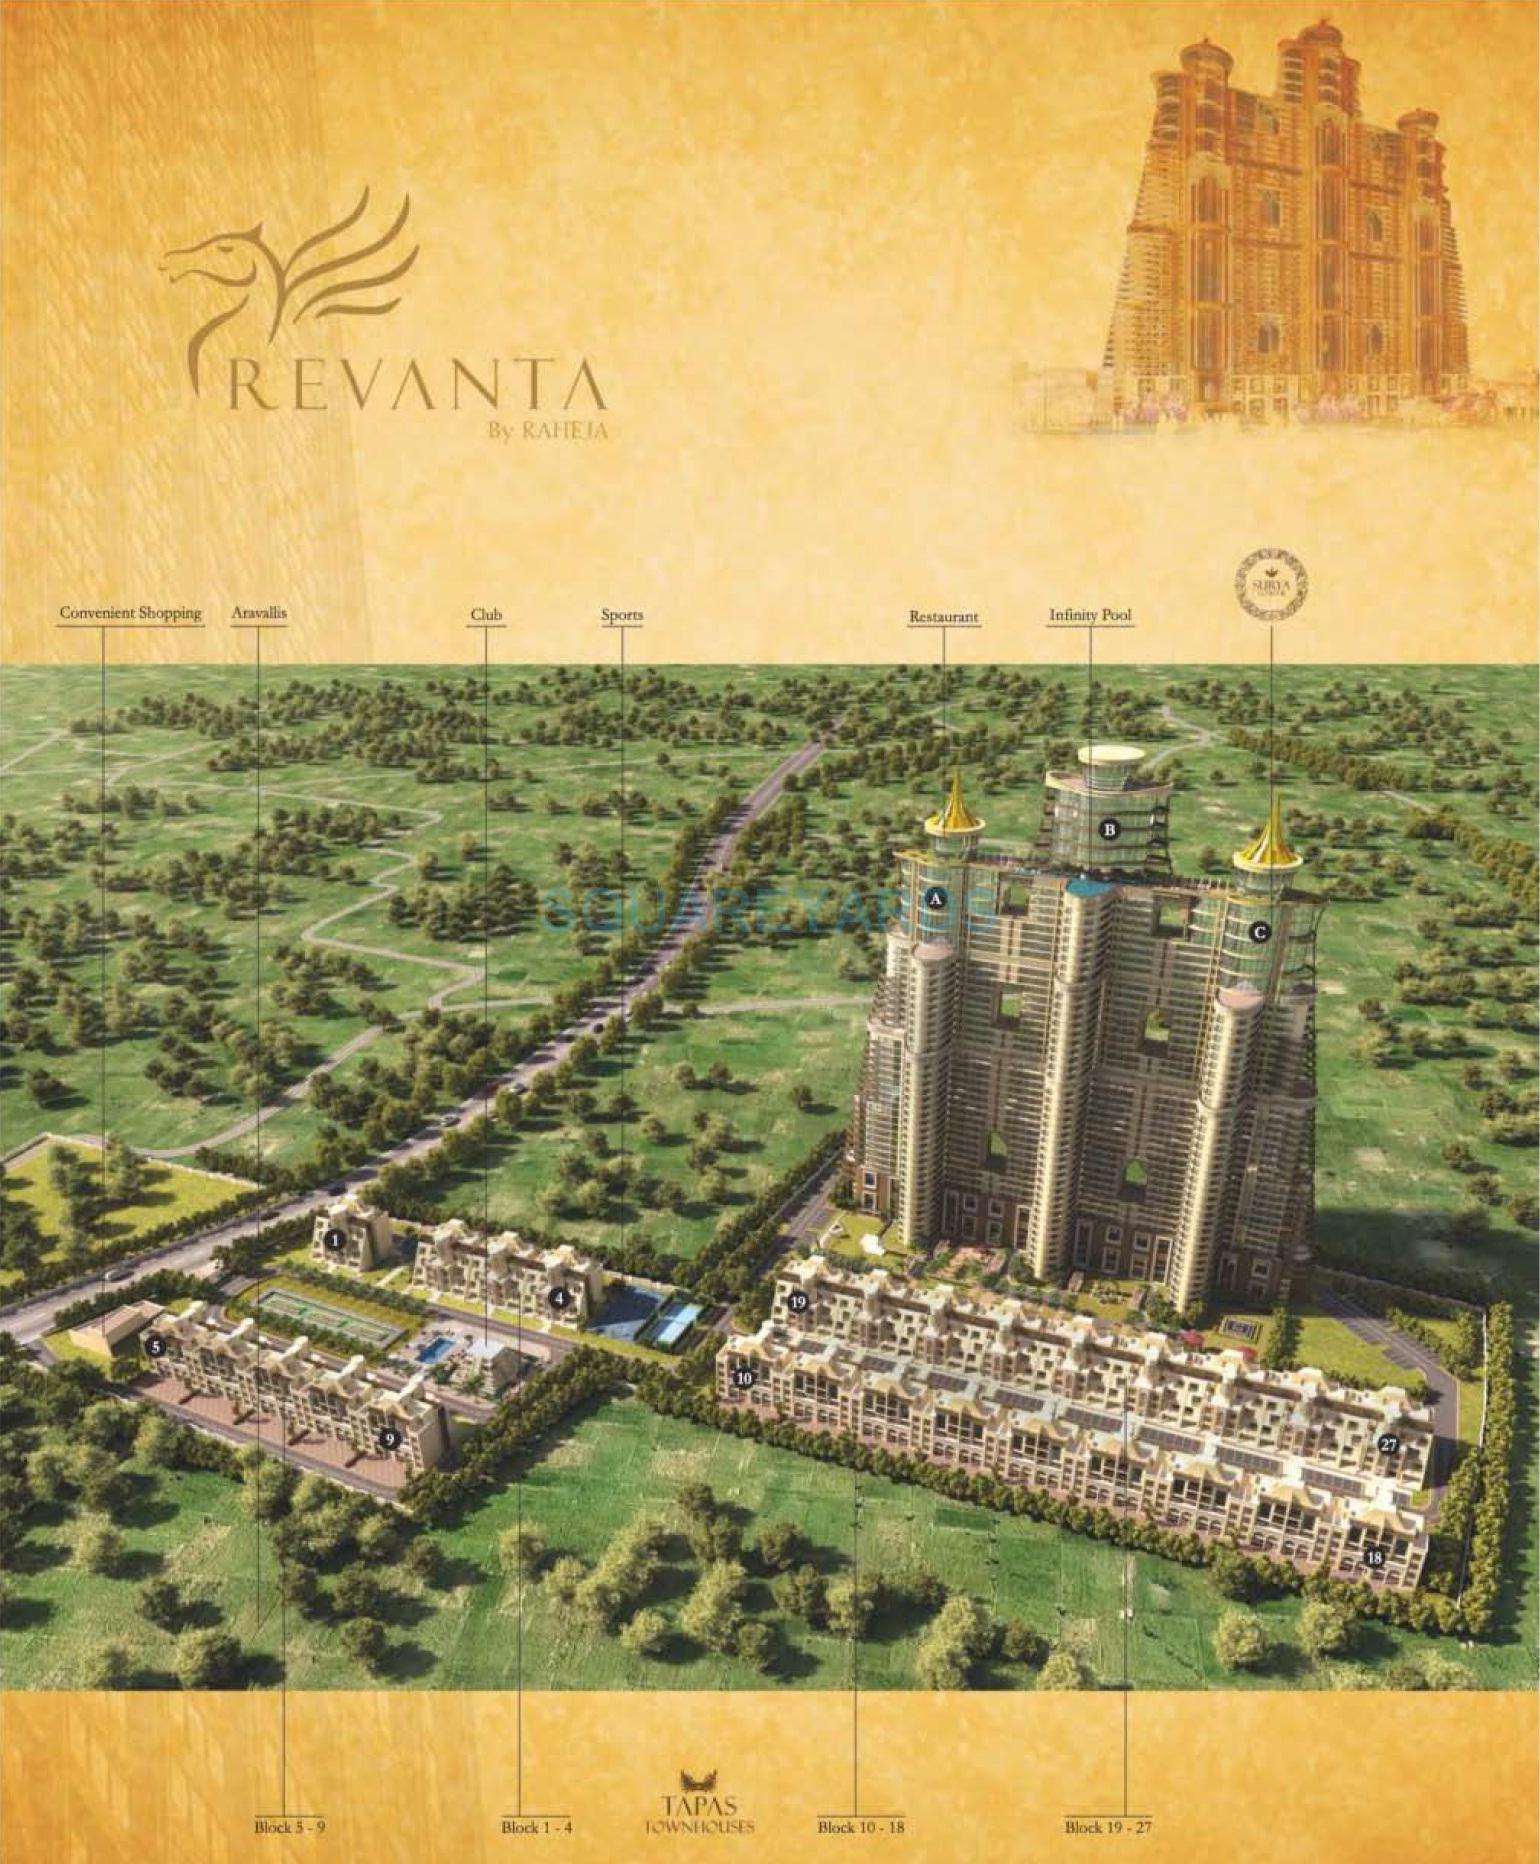 raheja revanta tapas townhouse master plan image1